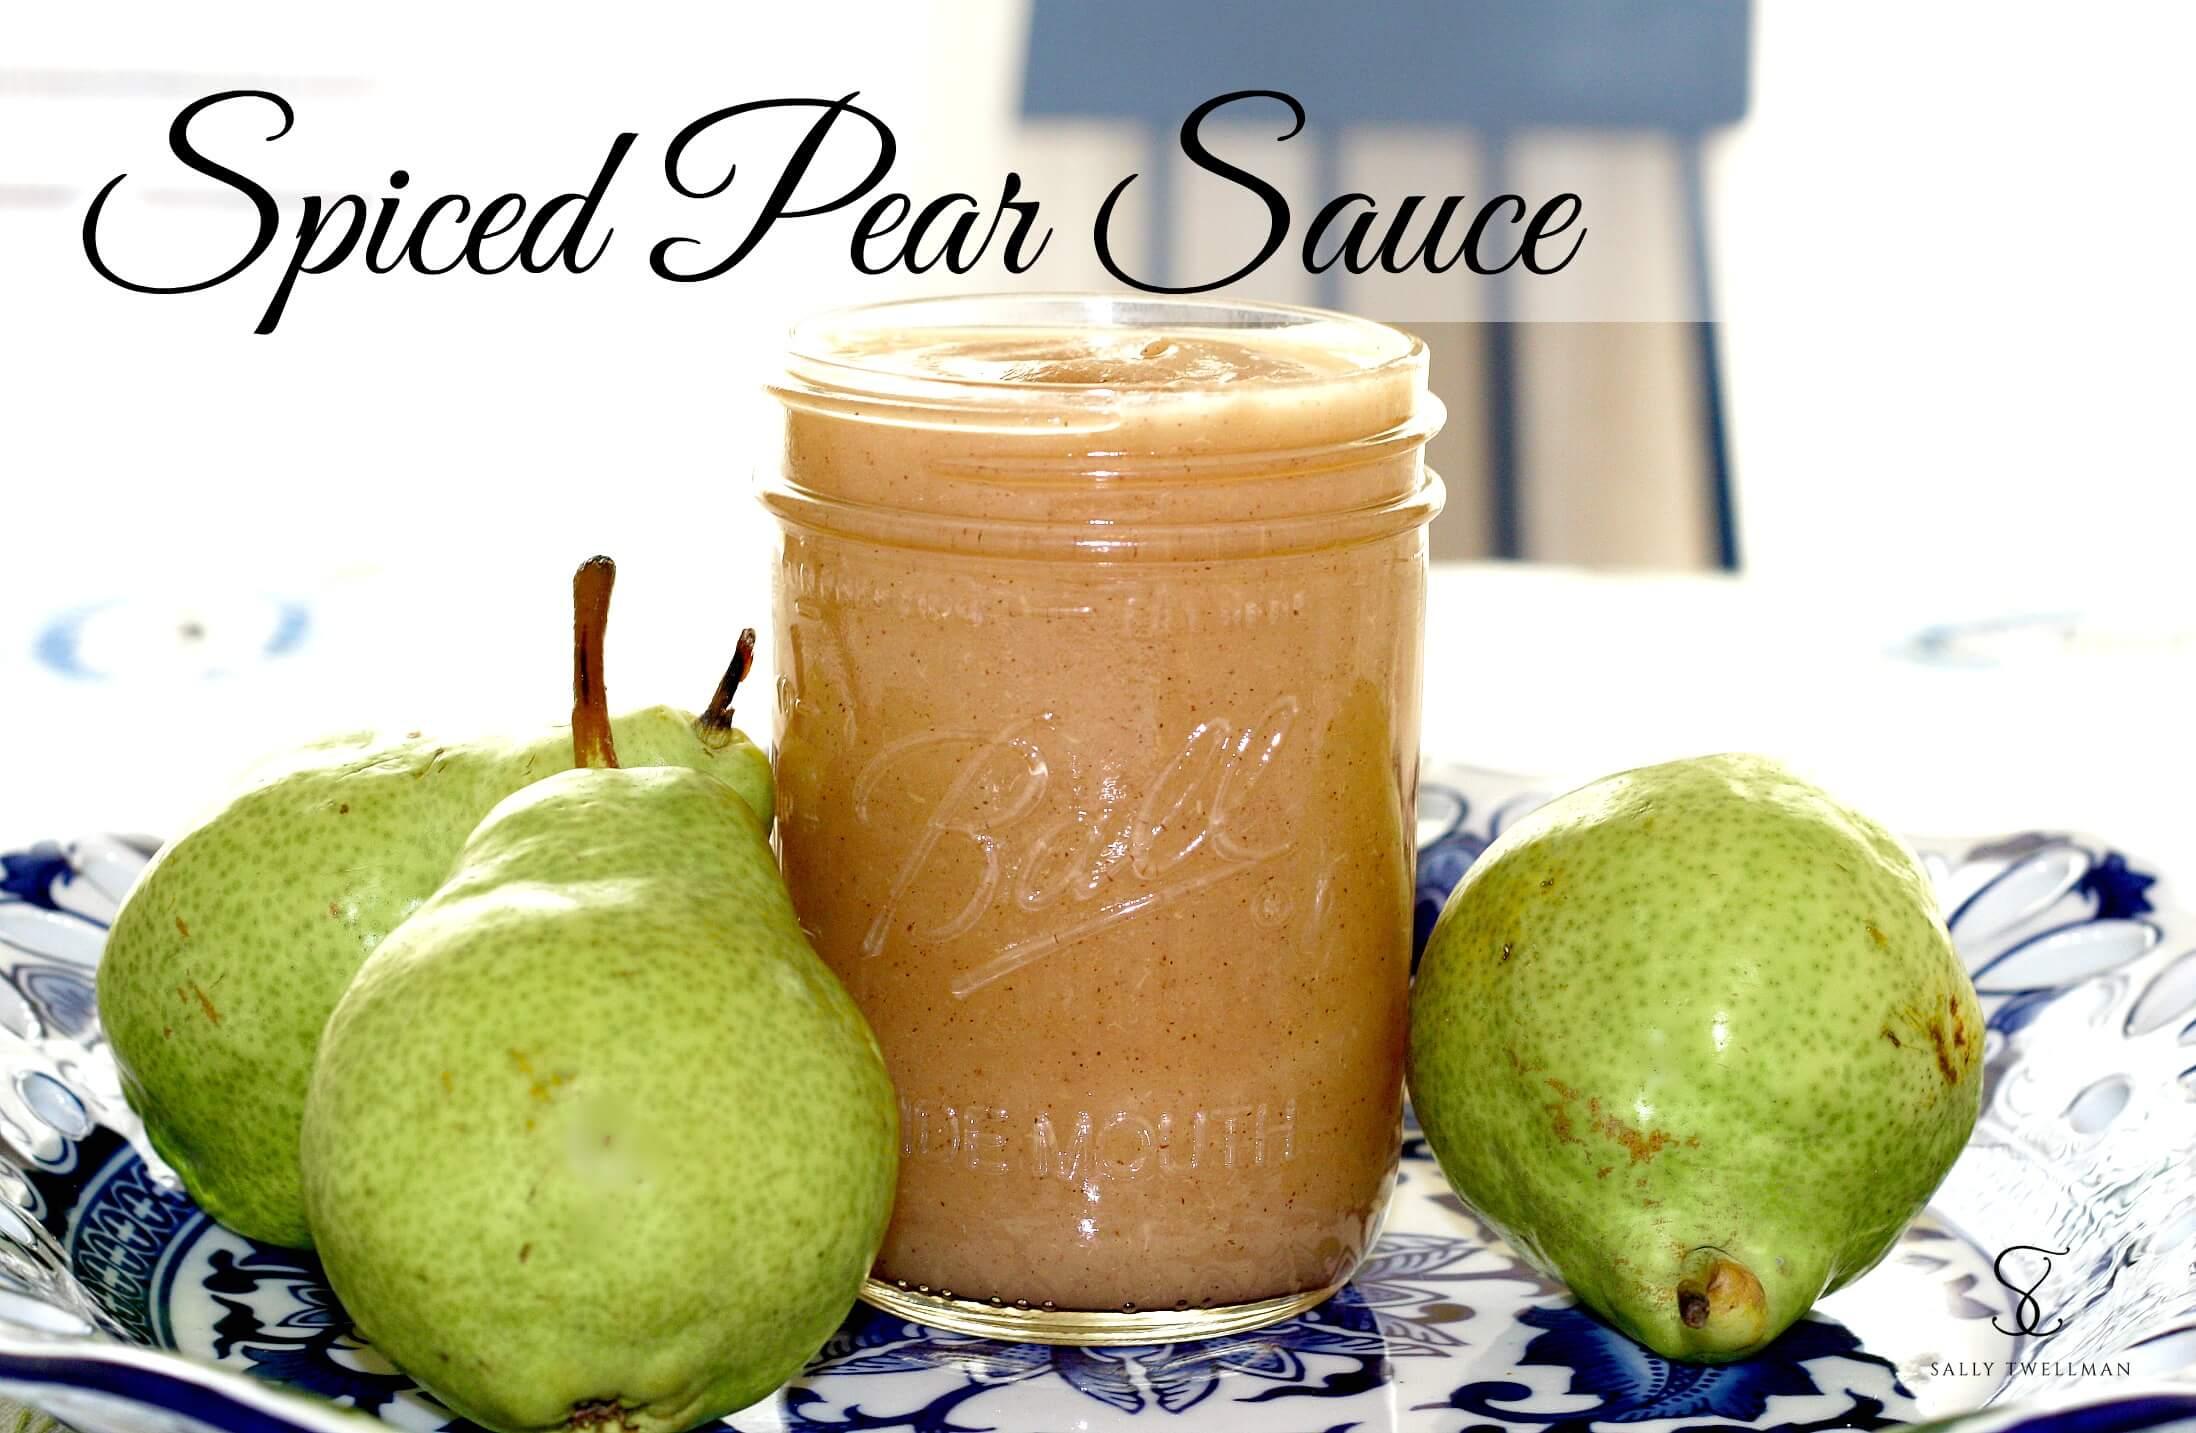 Best Jar Food To Start Baby On